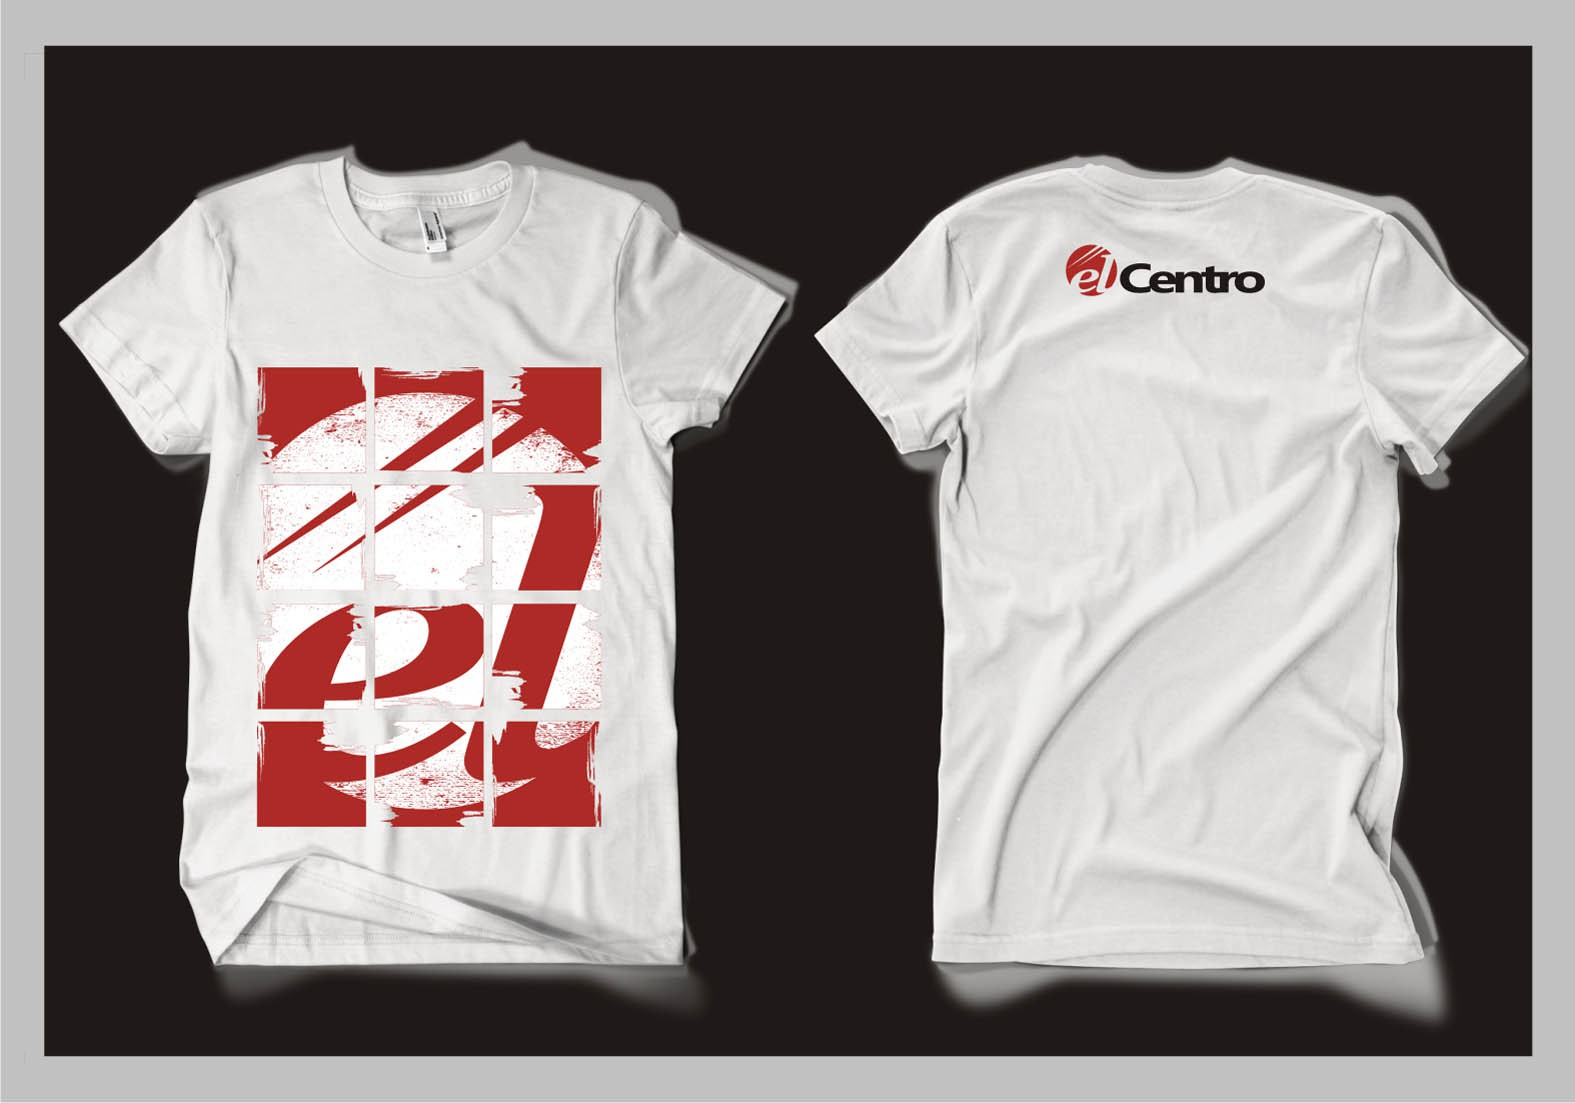 t-shirt design for El Centro